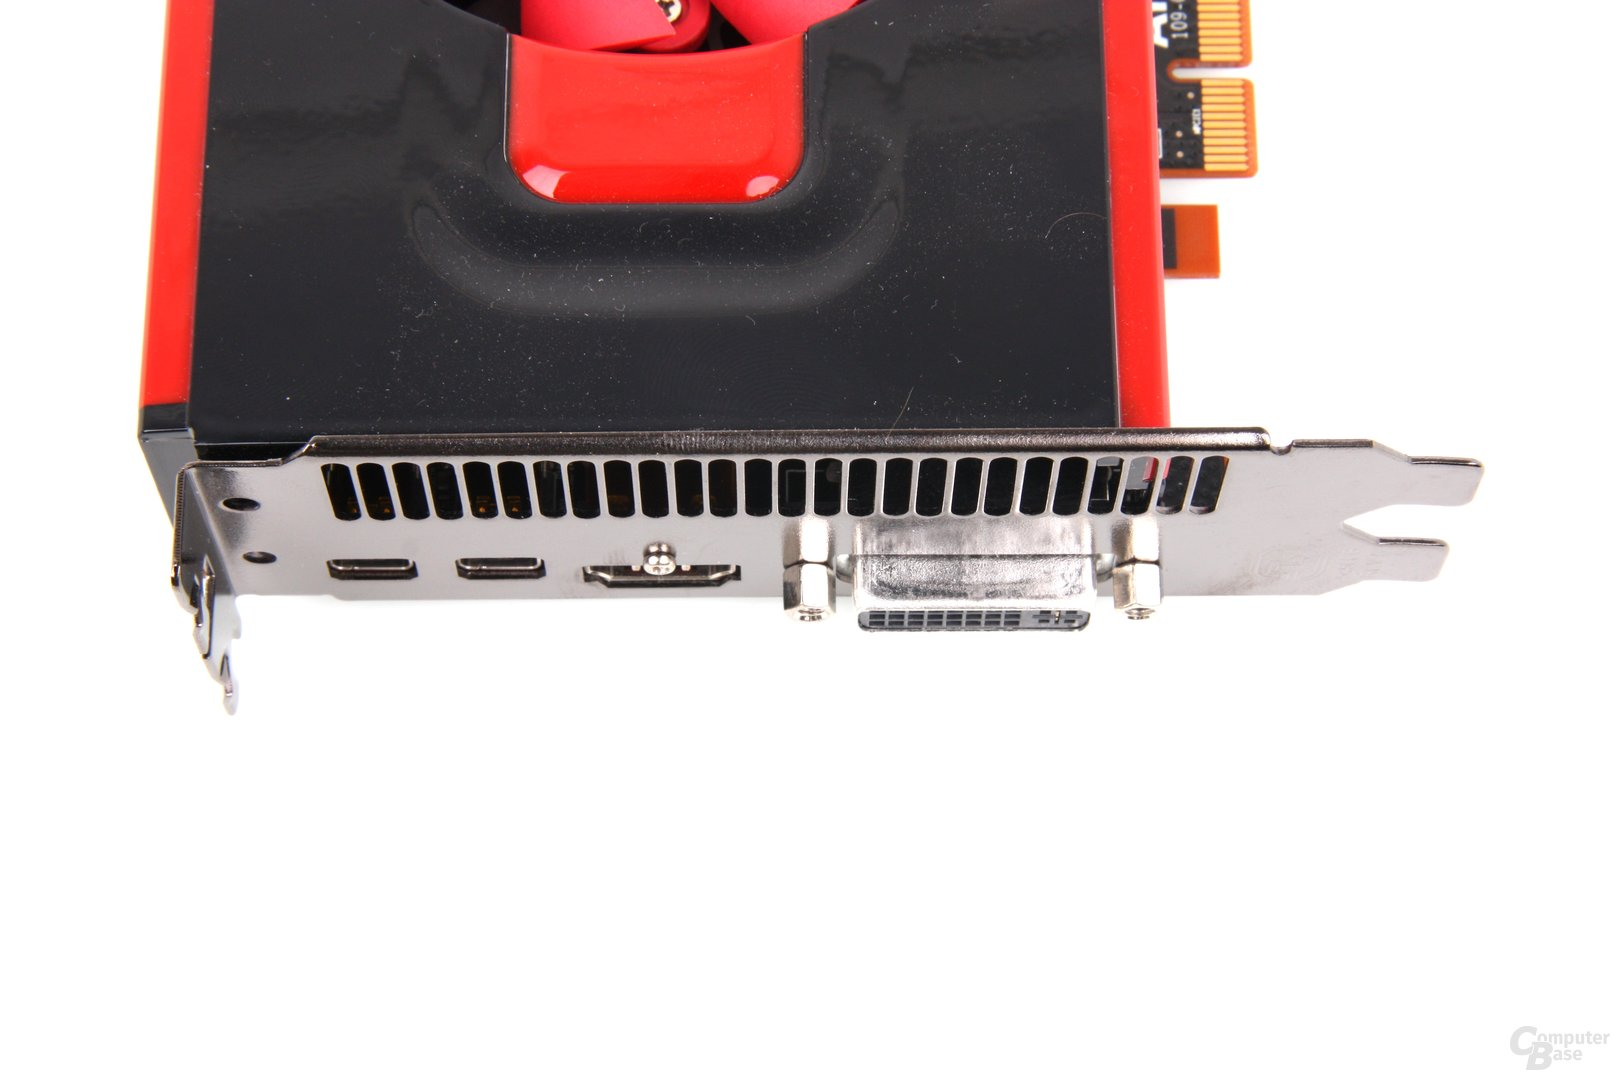 Radeon HD 7750 V2 Anschlüsse